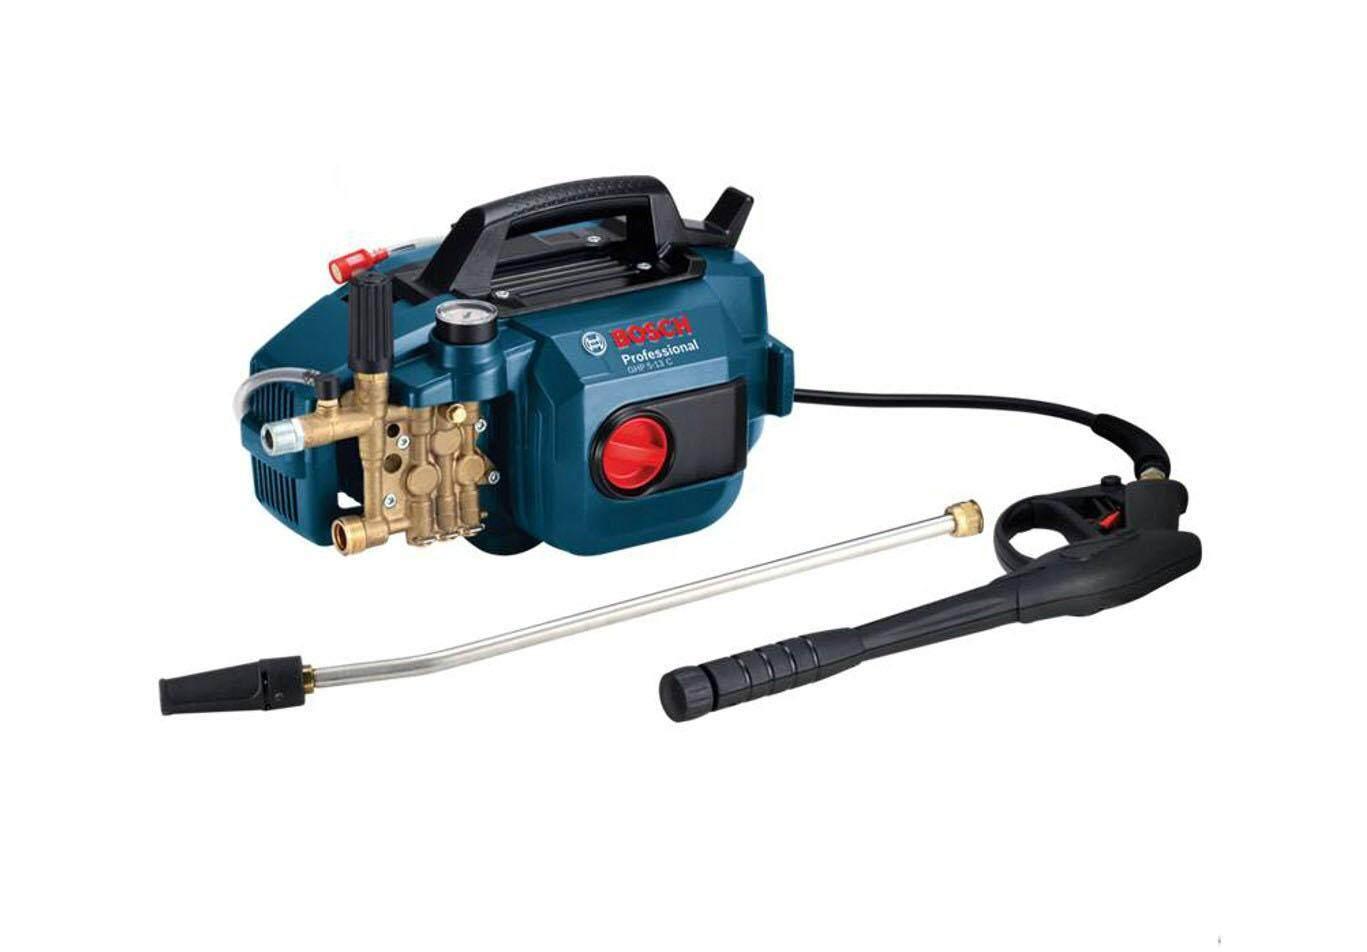 GHP5-13C Bosch Professional High Pressure Cleaner 130Bar520lh240V 06009100L0